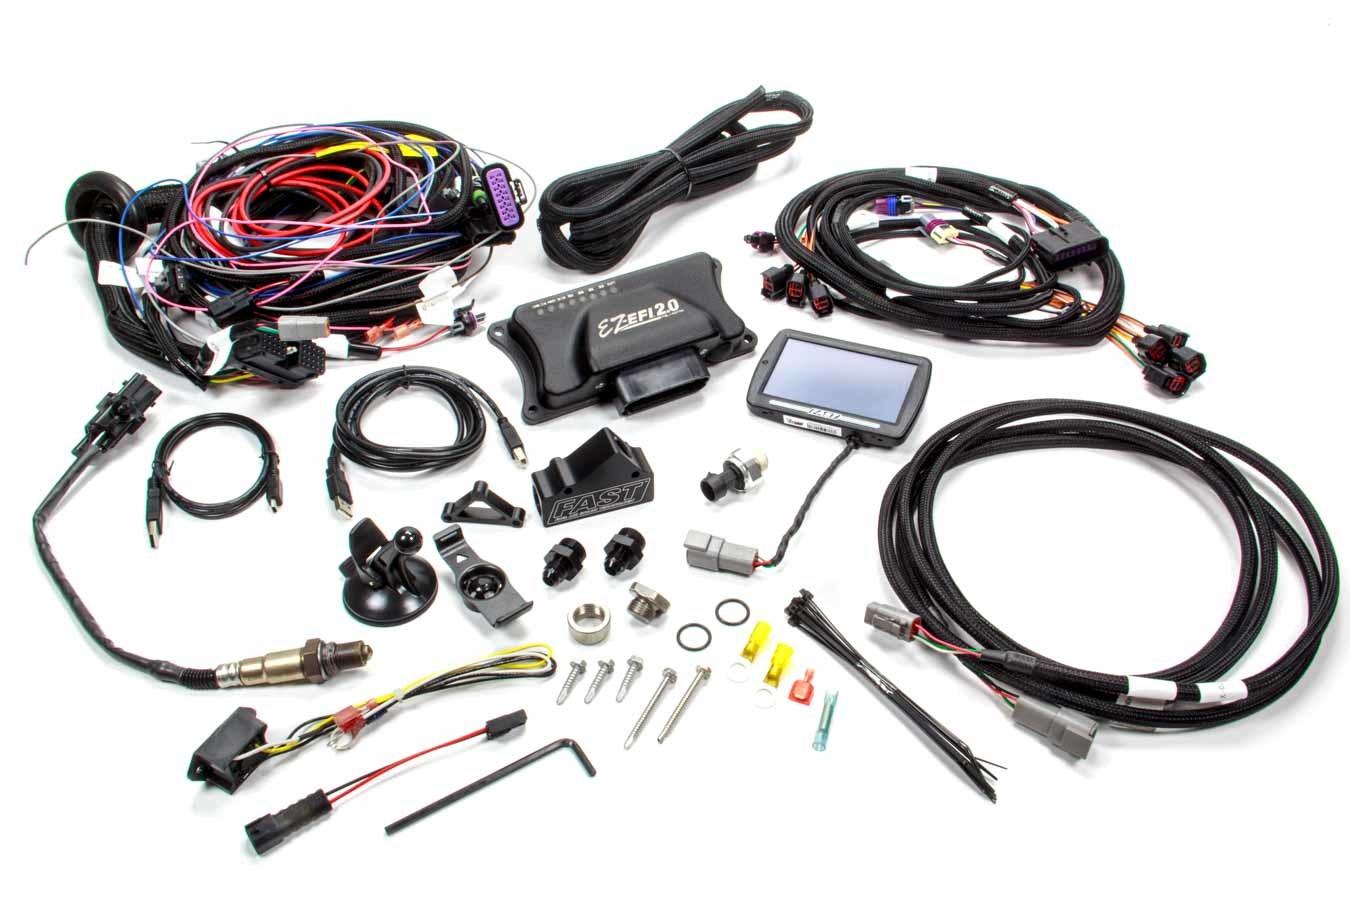 Fast Electronics Engine Control System EZ EFI-2 Multi